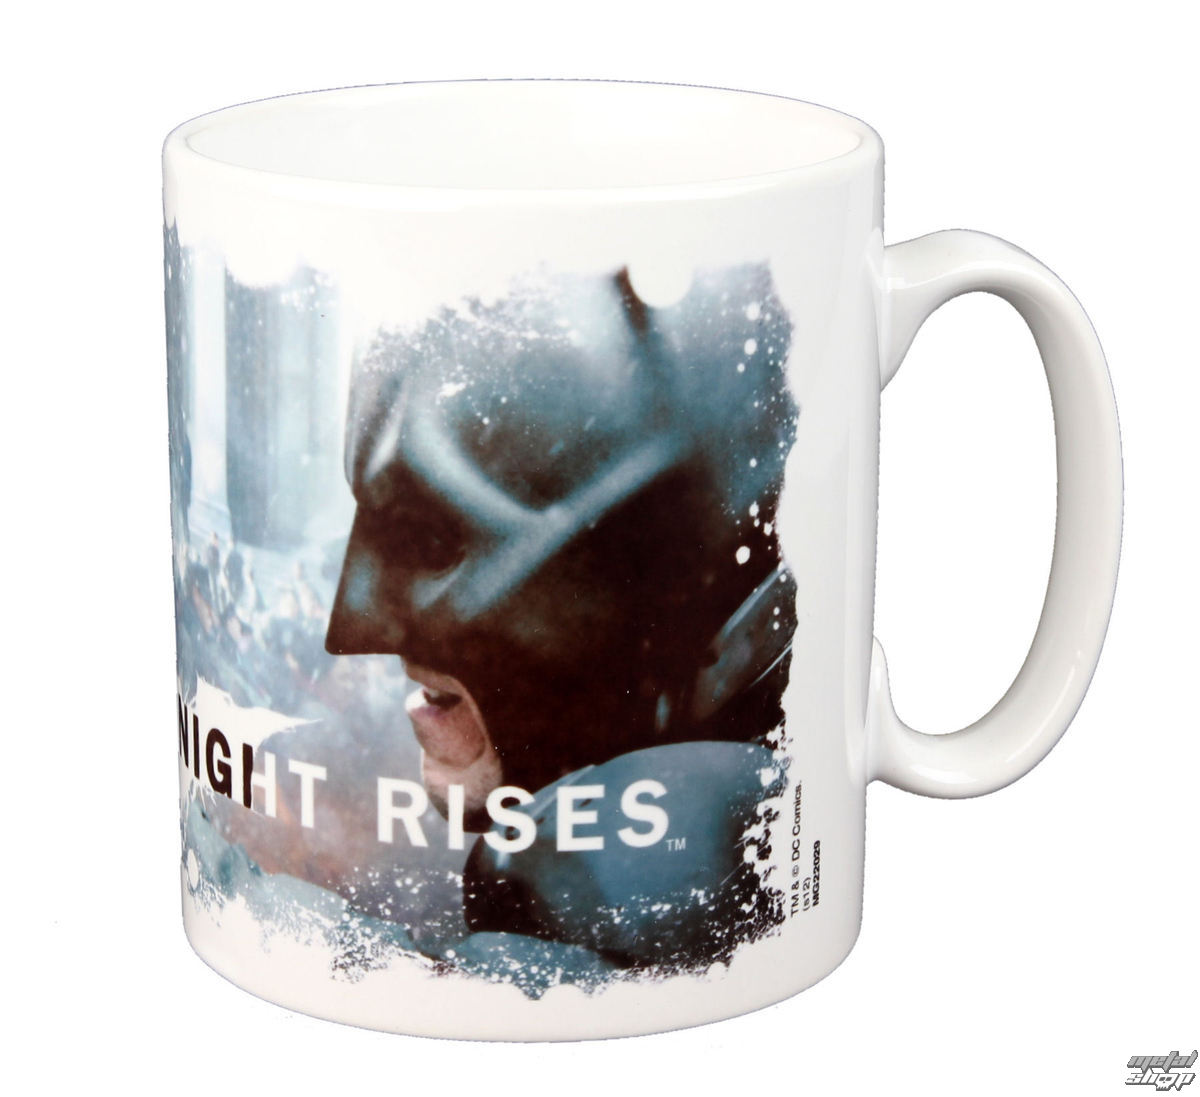 hrnček The Dark Knight Rises (Mask) - Pyramid Posters - MG22029